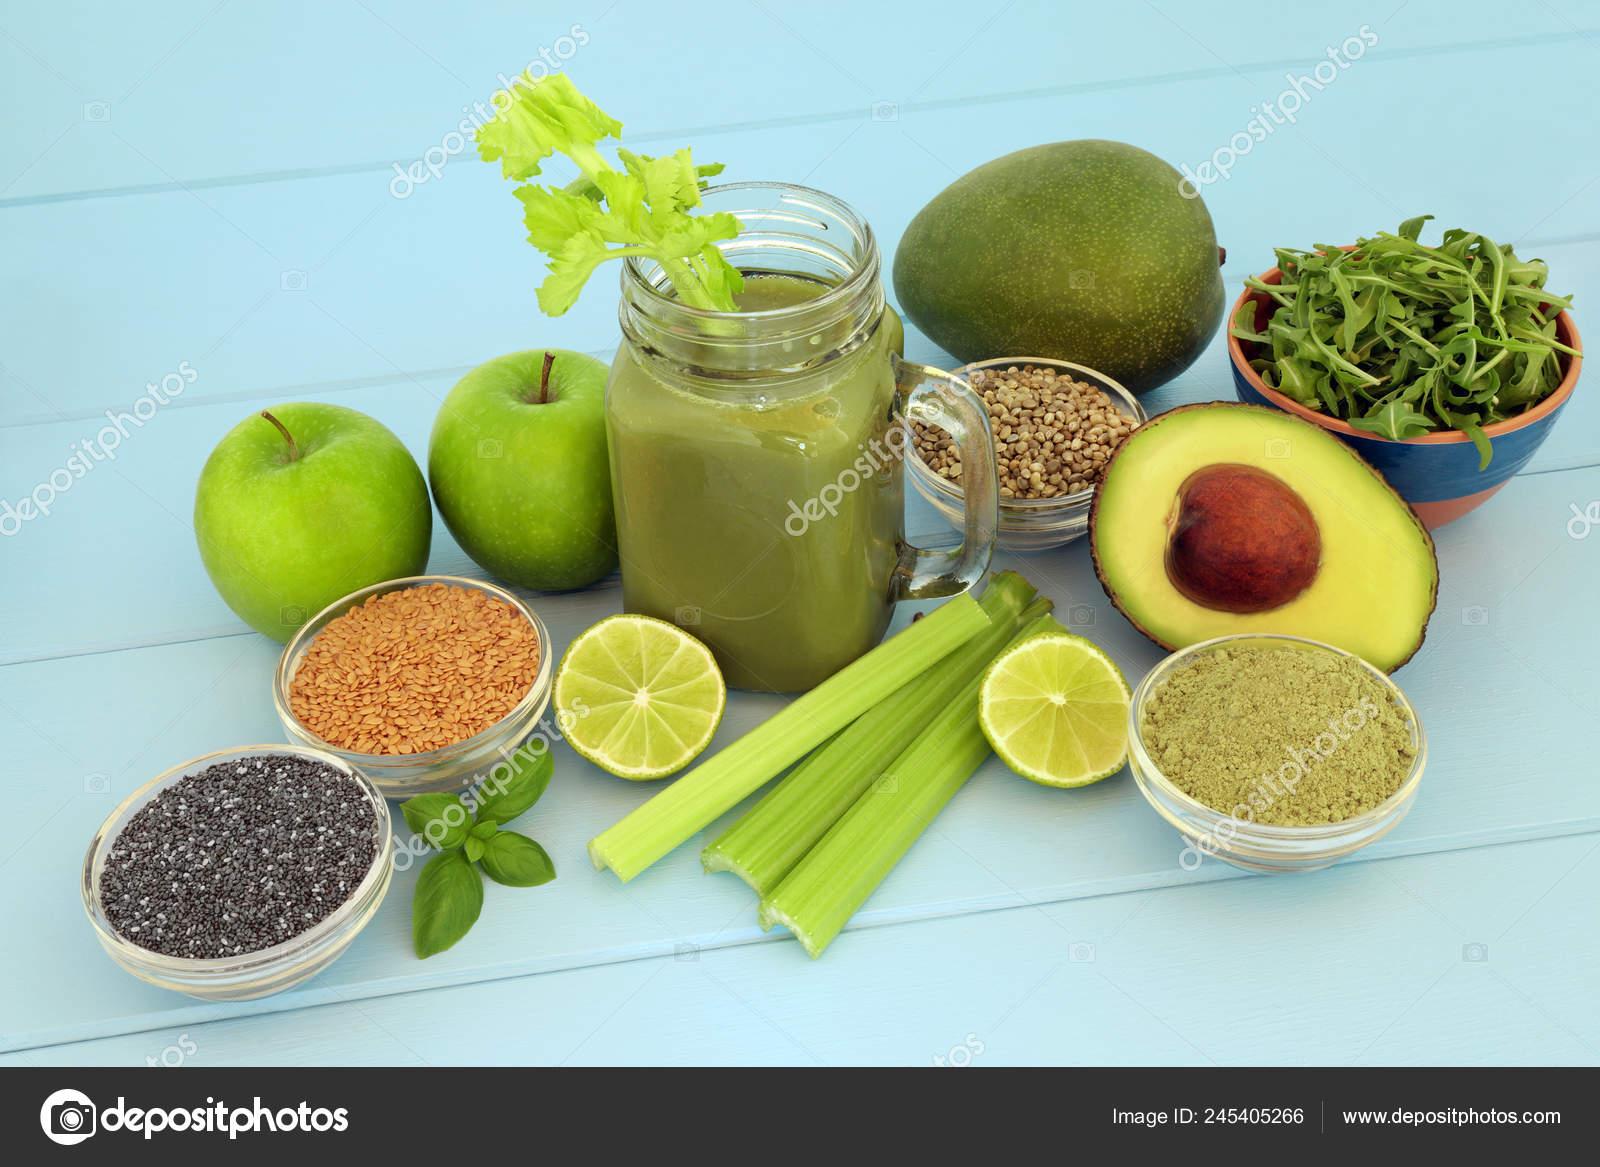 Health Food Diet Smoothie Drink Fresh Fruit Vegetables Matcha Powder Stock Photo C Marilyna 245405266